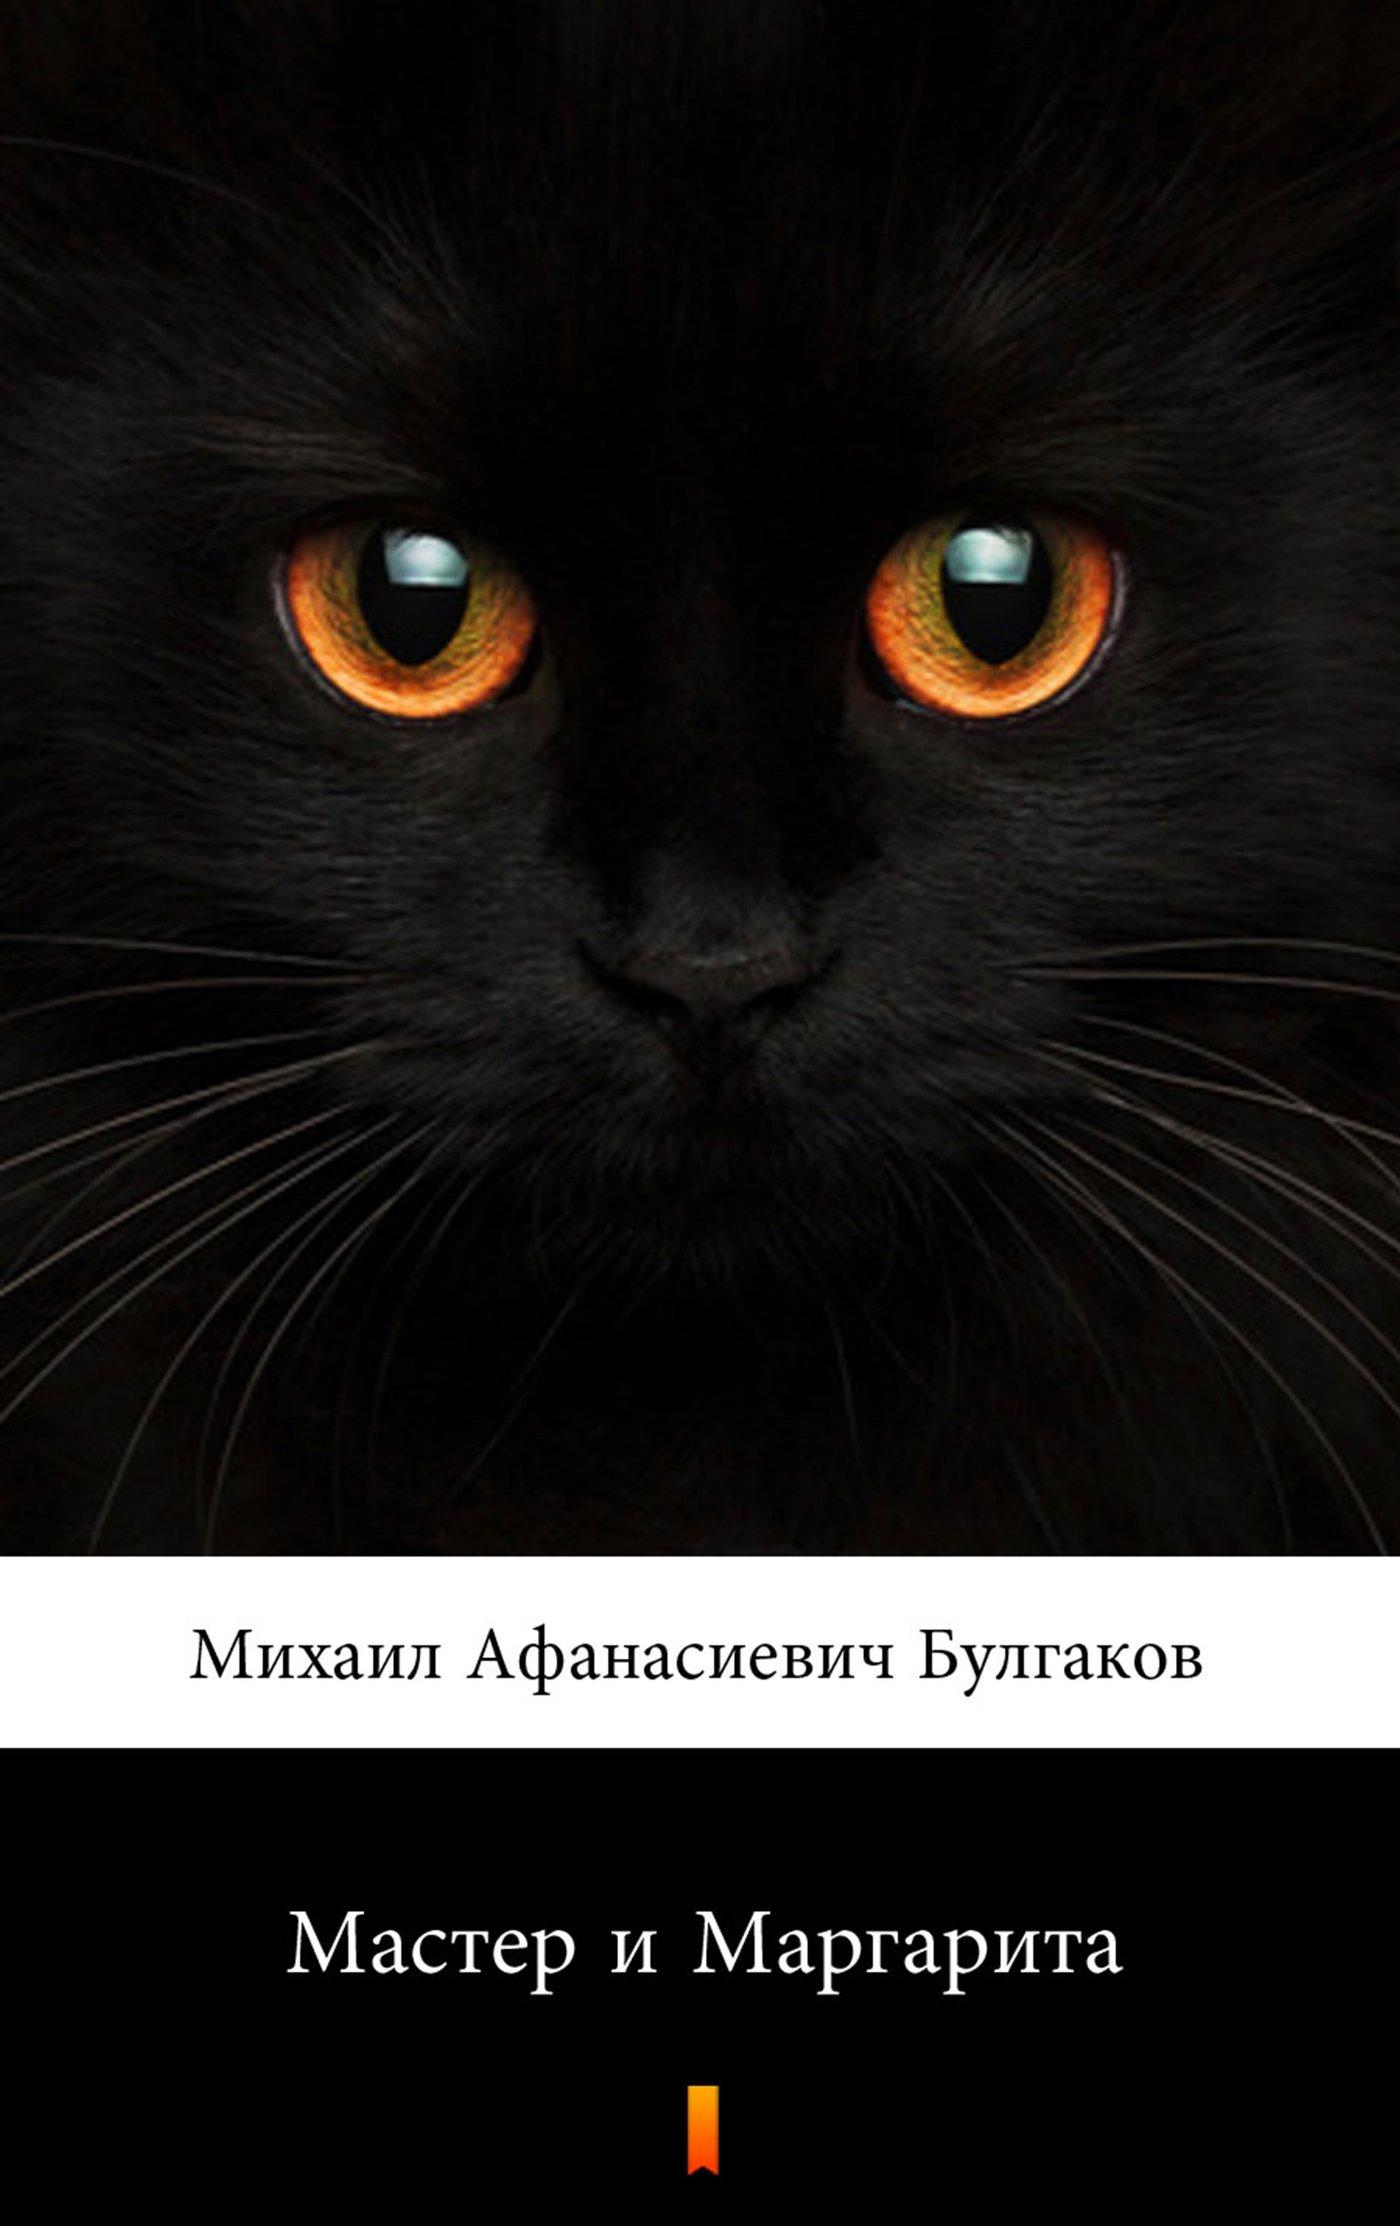 Мастер и Маргарита - Ebook (Książka na Kindle) do pobrania w formacie MOBI